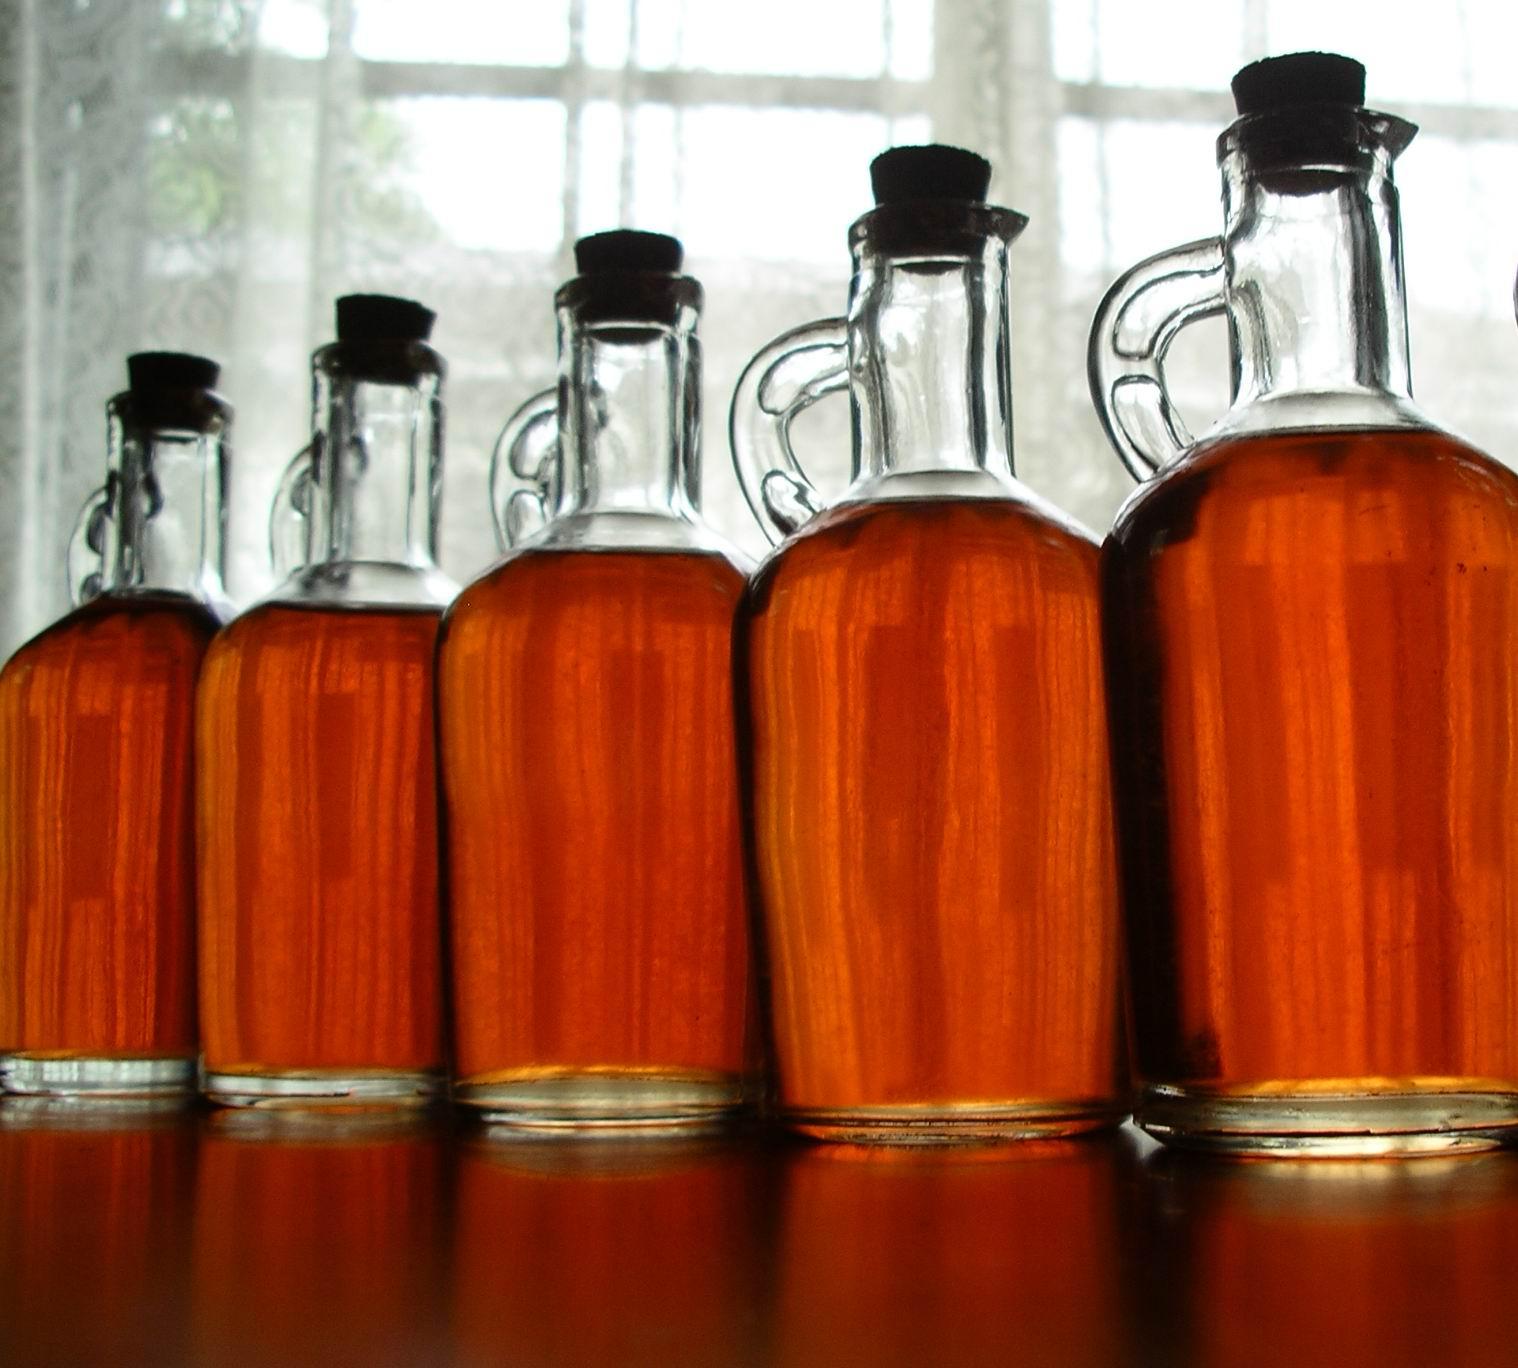 File:Homemade strawberry liqueur.jpg - Wikimedia Commons